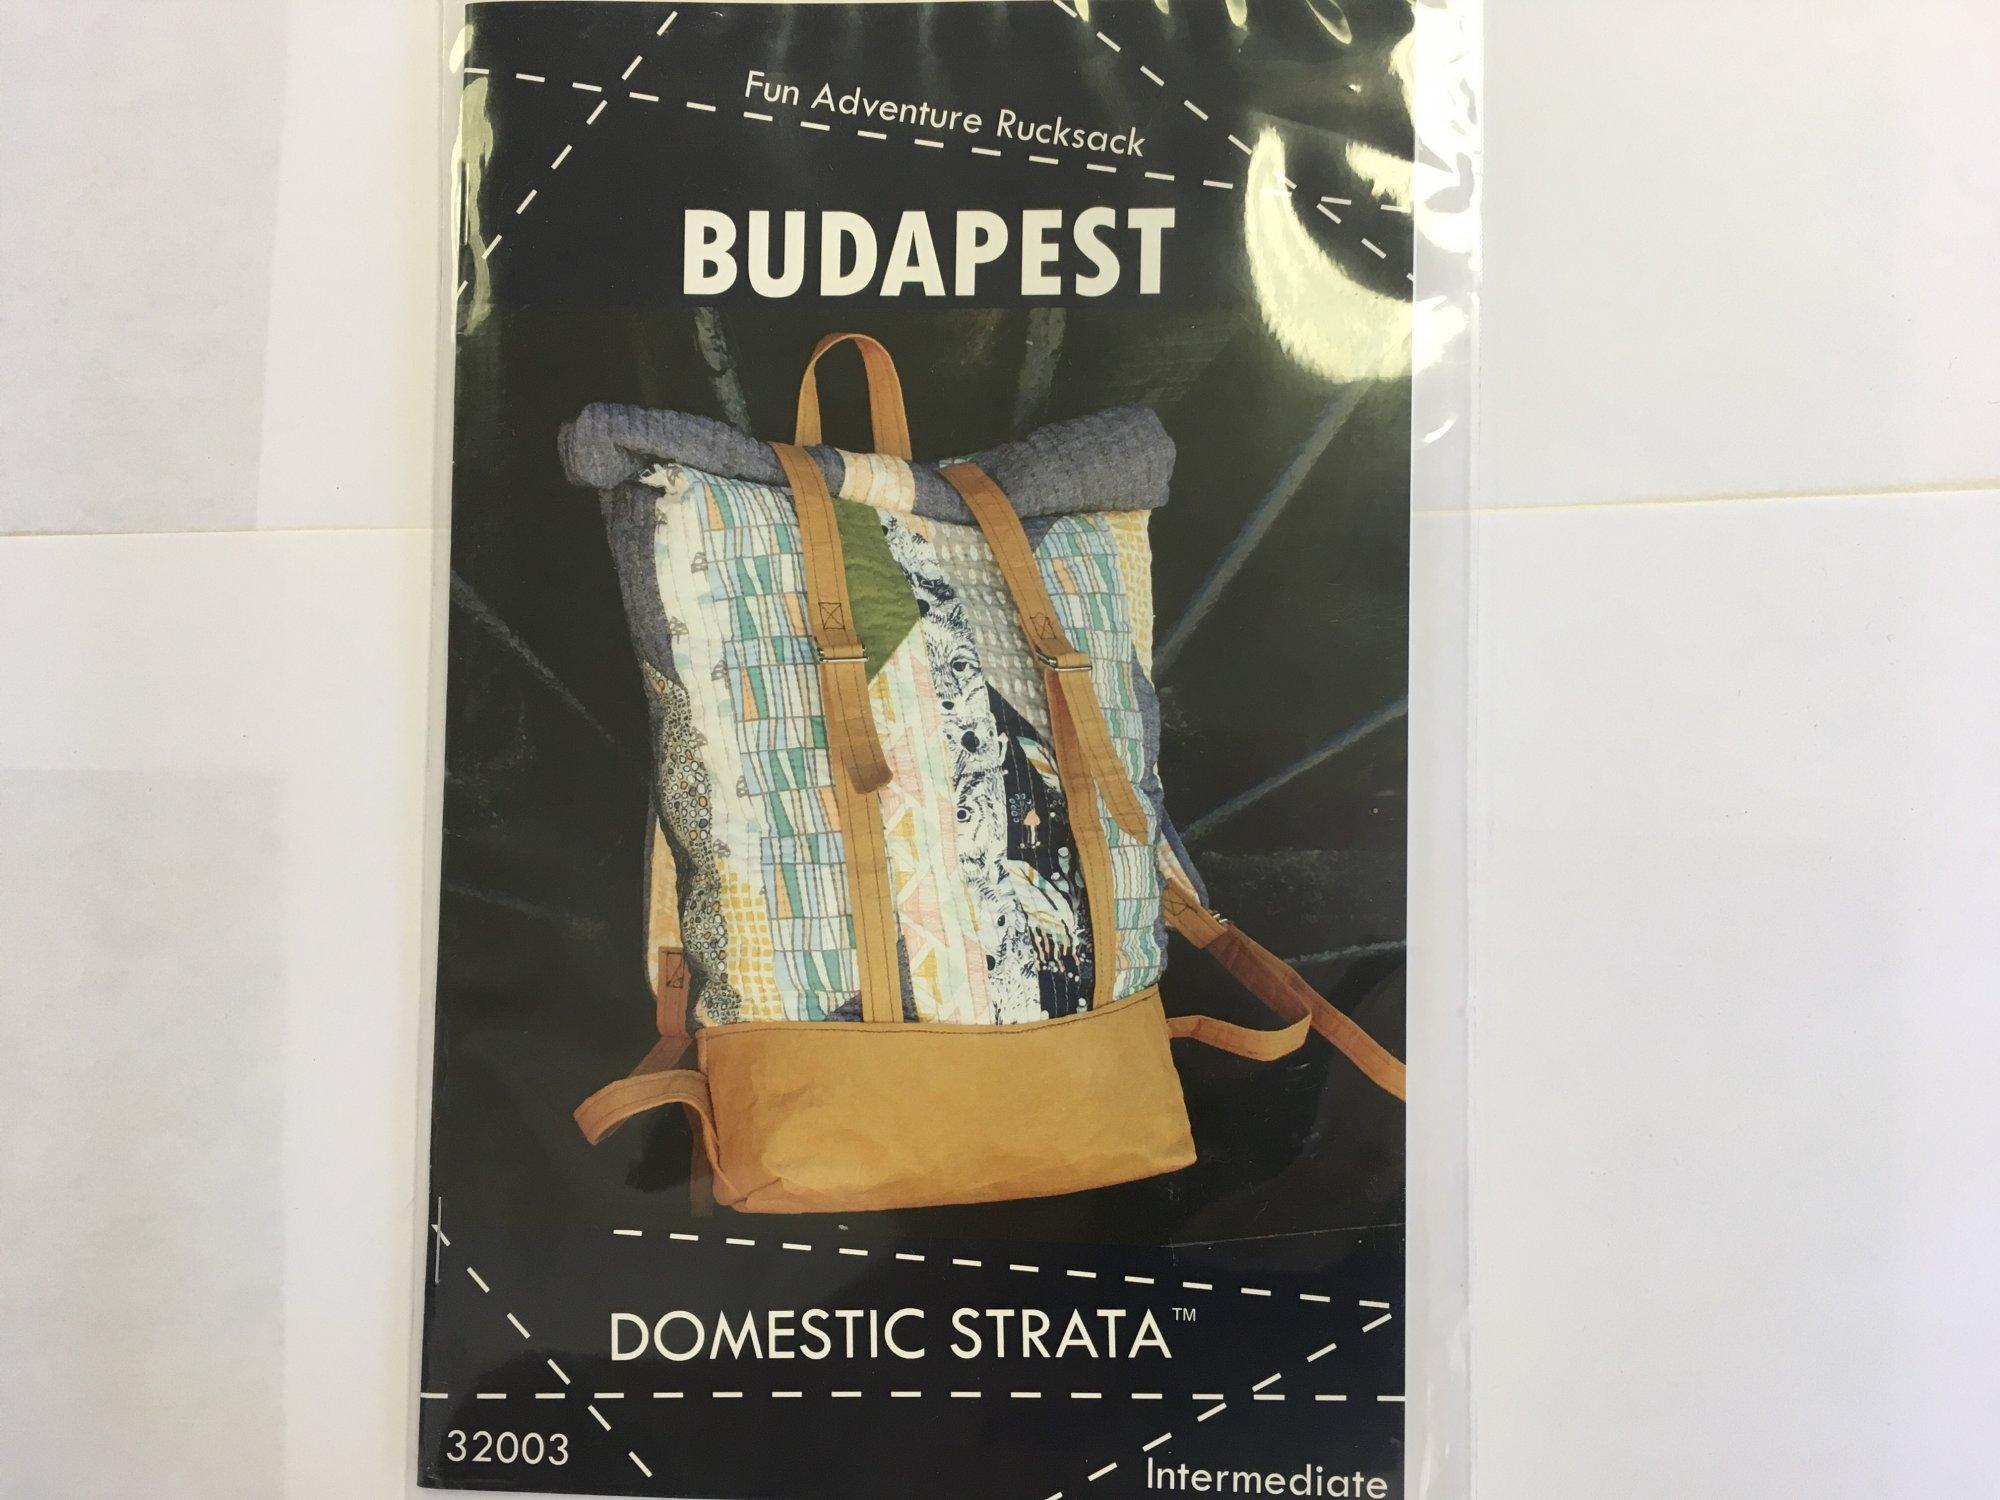 BUDAPEST ADVENTURE RUCKSACK by Domestic Strata, LLC  32003